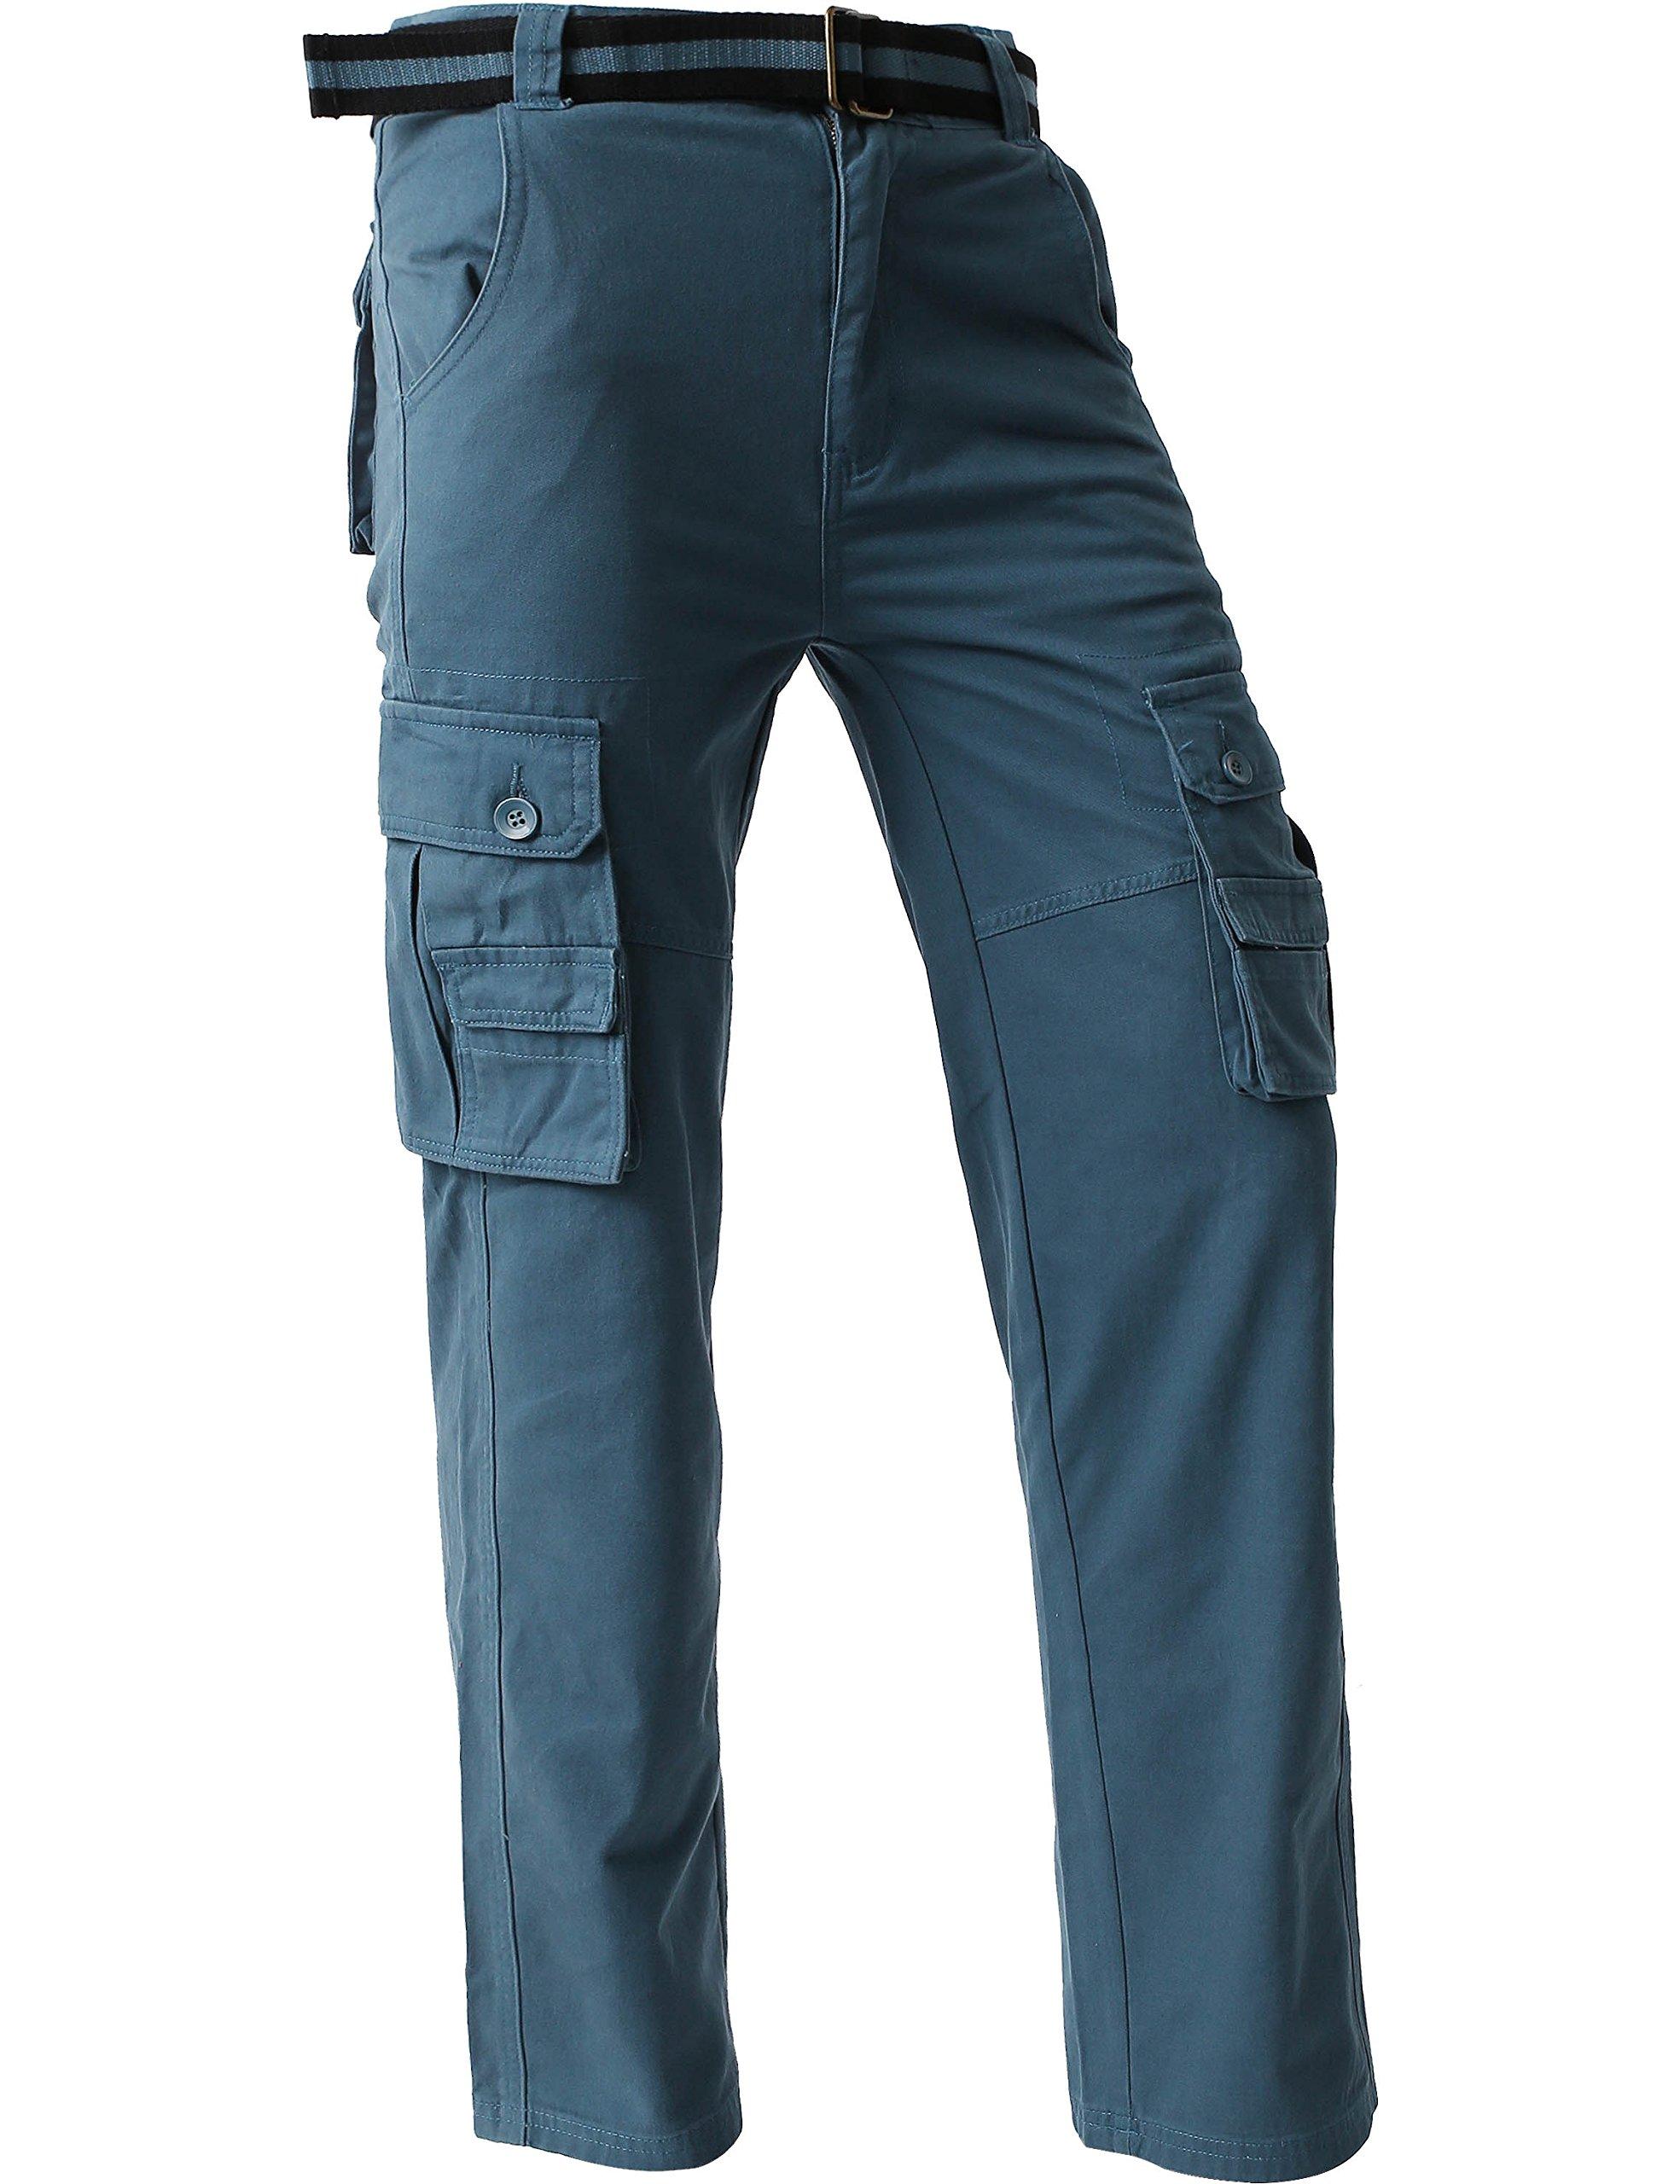 Ma Croix JP Mens Cargo Pants with Utility Belt (40/ pj01_dkblue) by Ma Croix (Image #4)